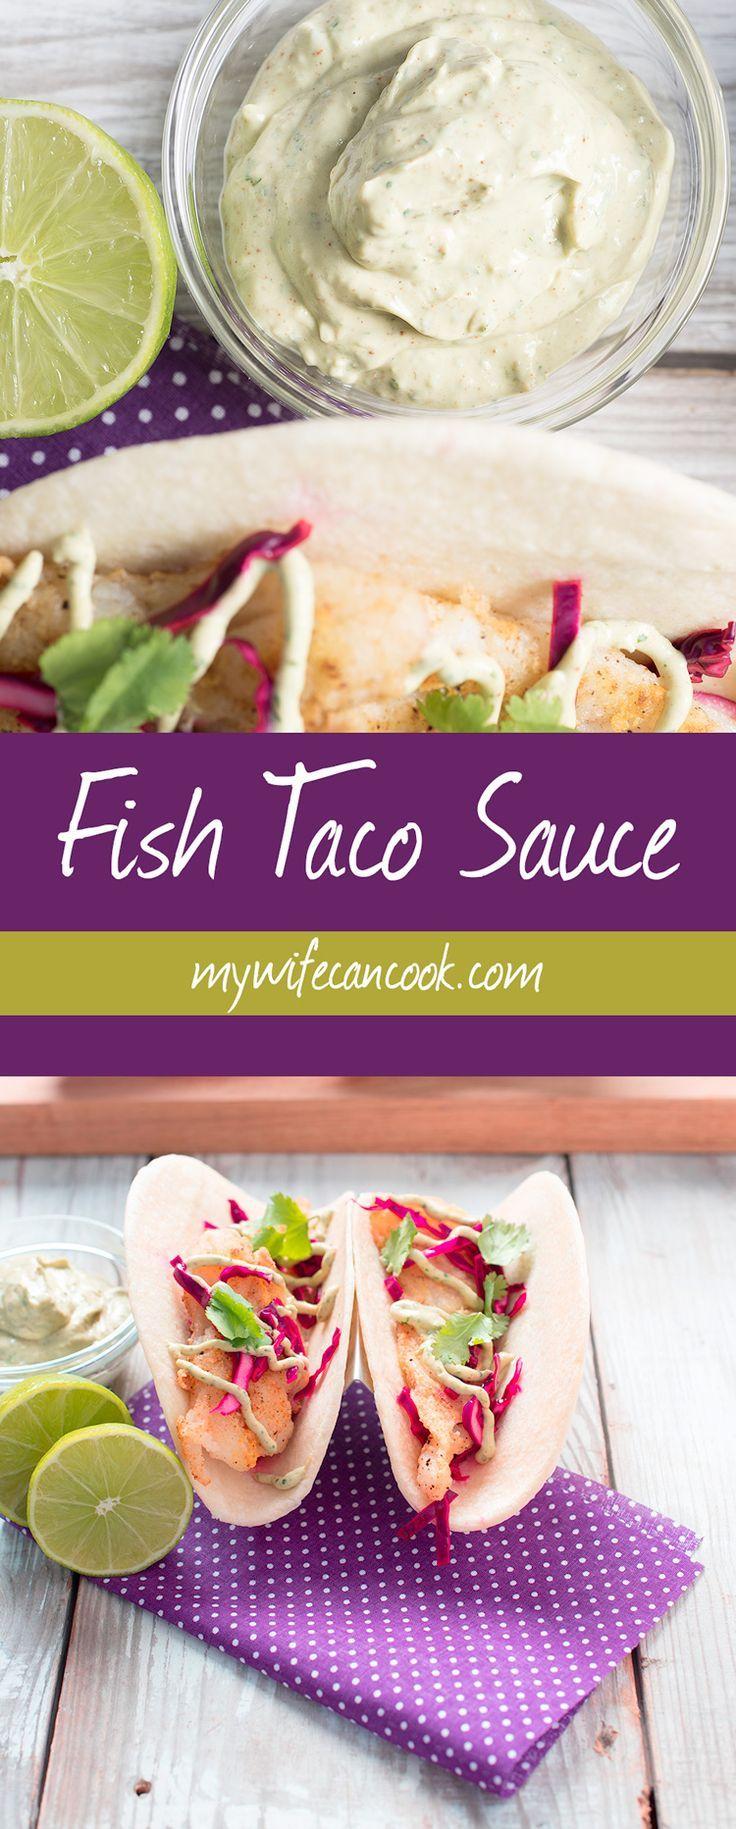 Fish Taco Sauce Recipe Fish taco sauce, Taco sauce